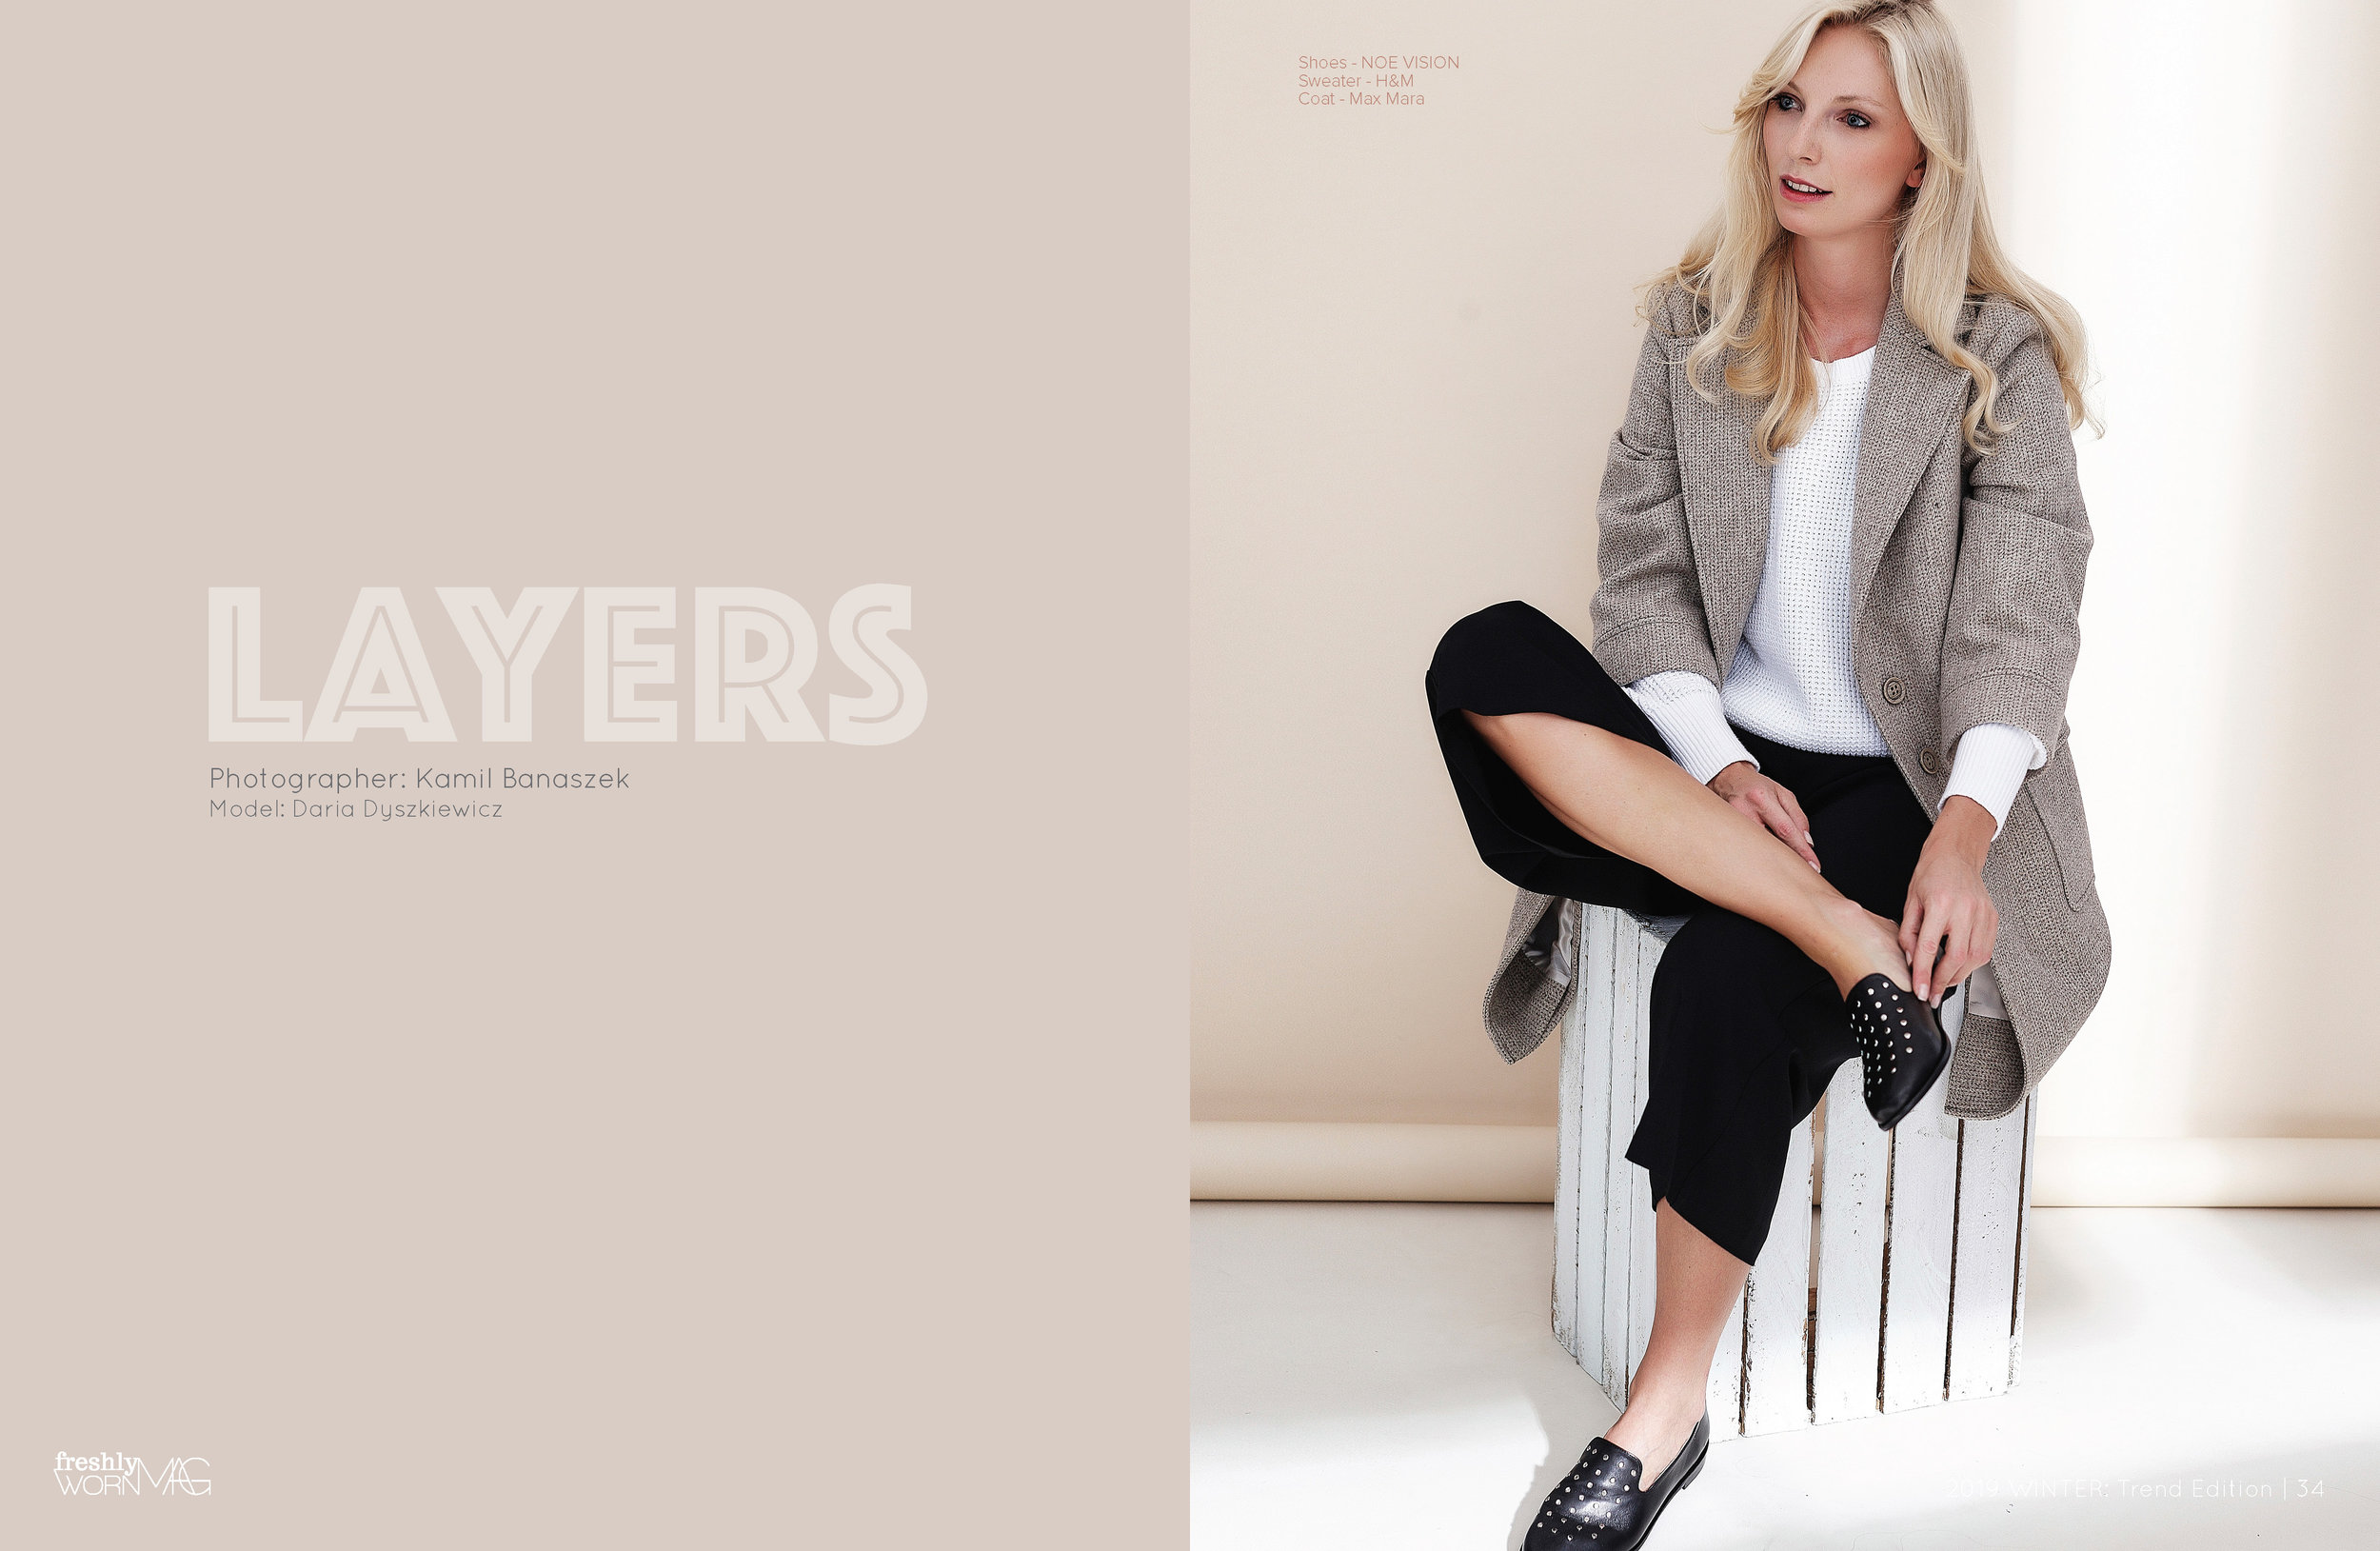 Layers_Page_1.jpg